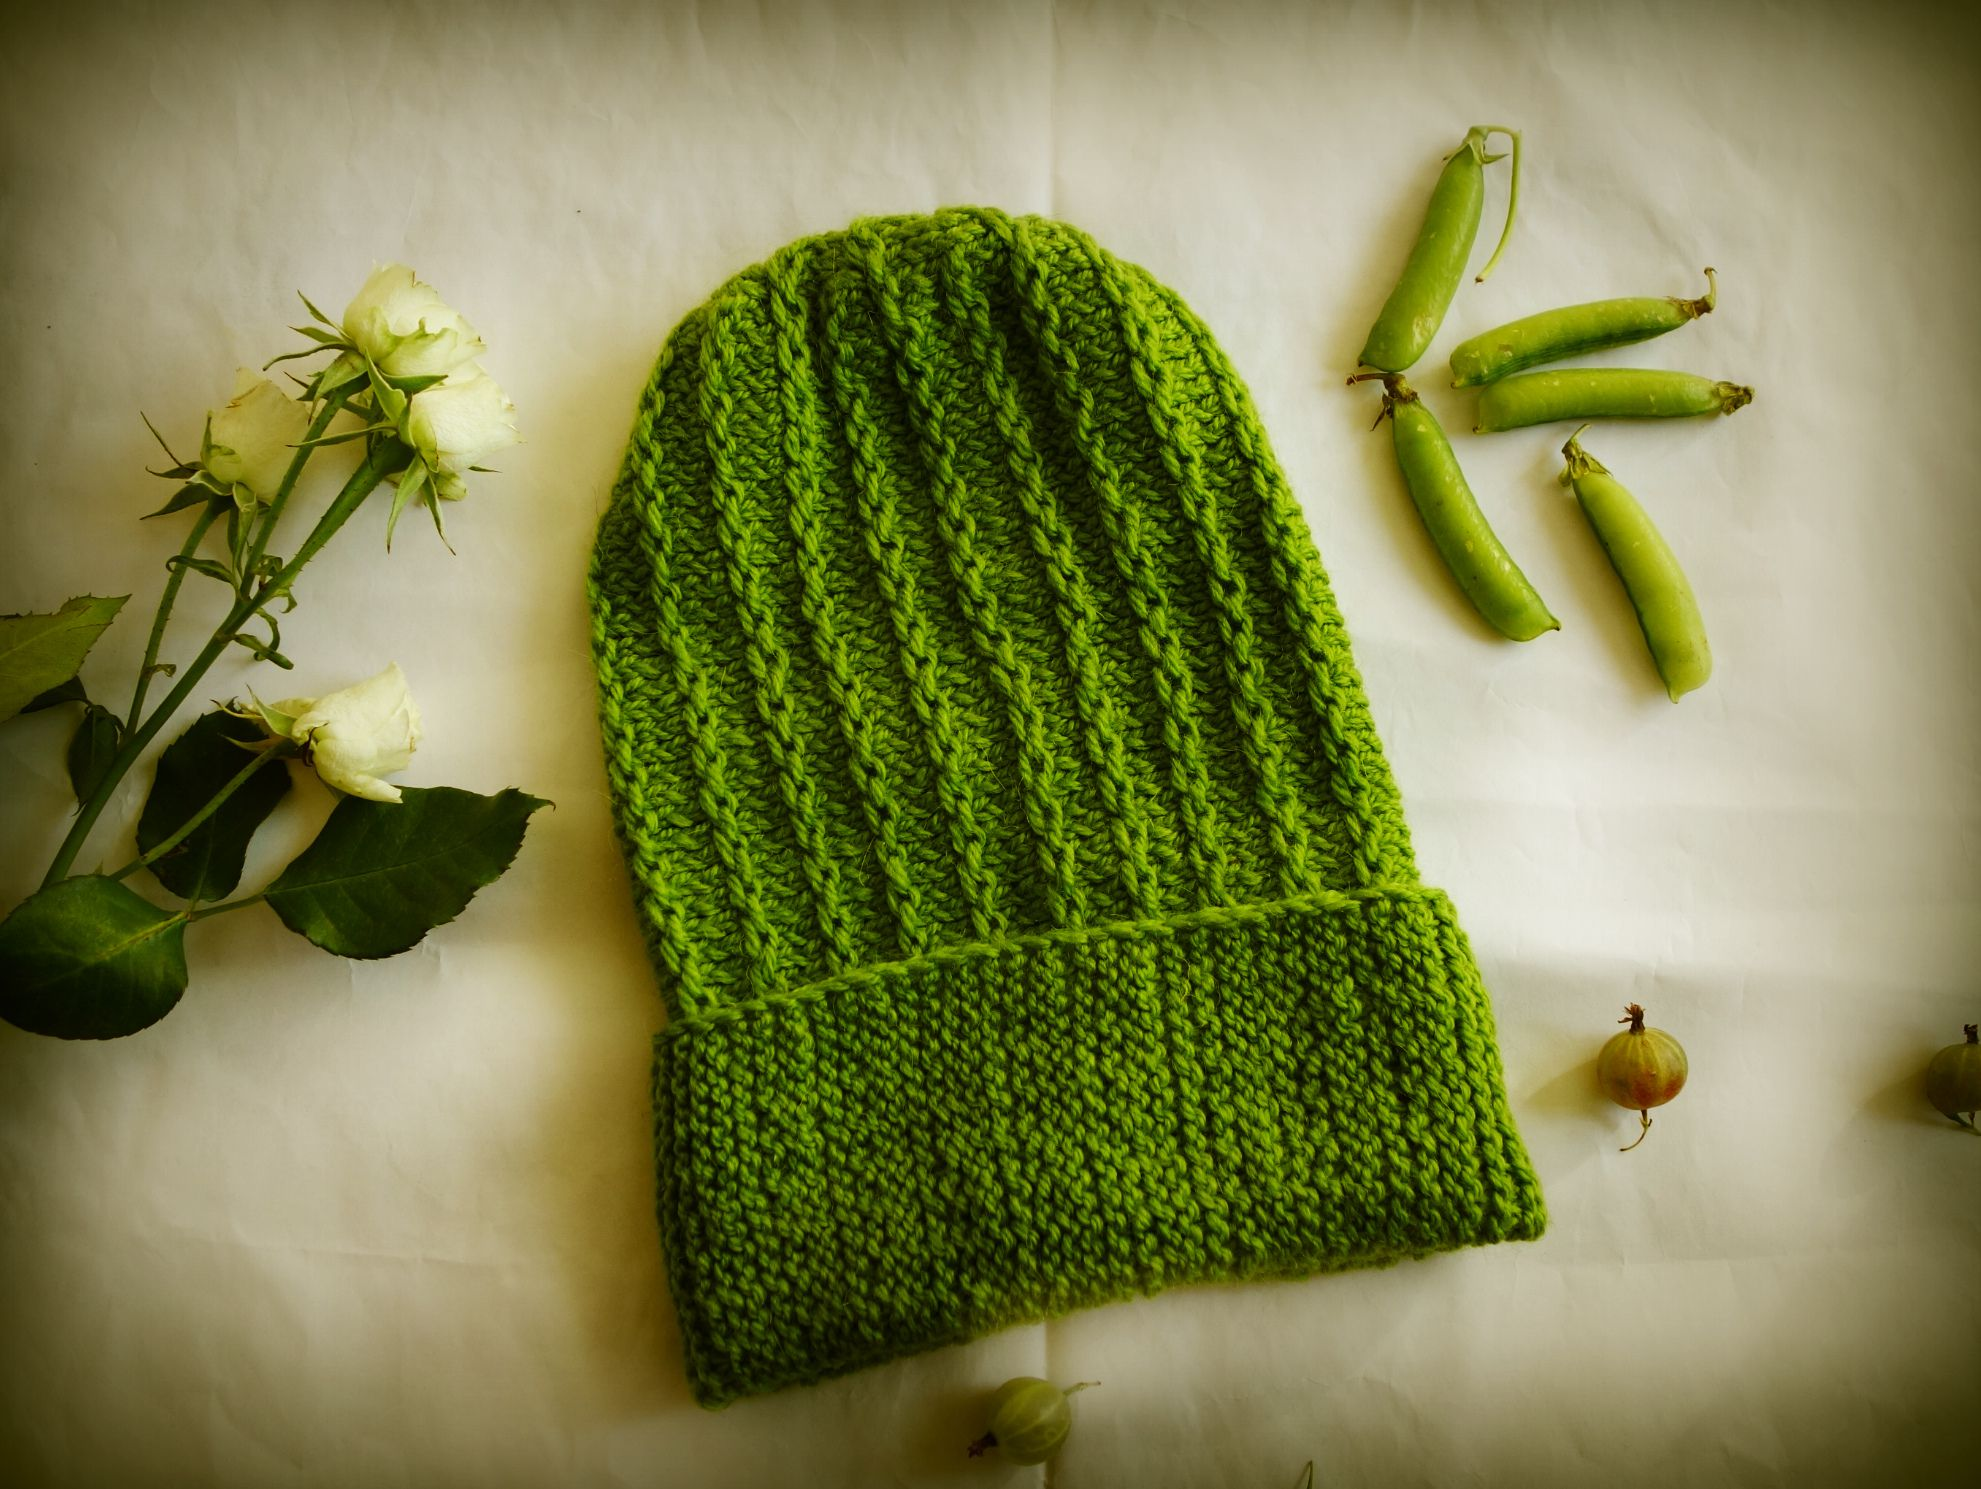 шапкабини моднаяшапка аксессуар шапкатыковка зеленаяшапка шапкавязаная вязание подарок ручнаяработа